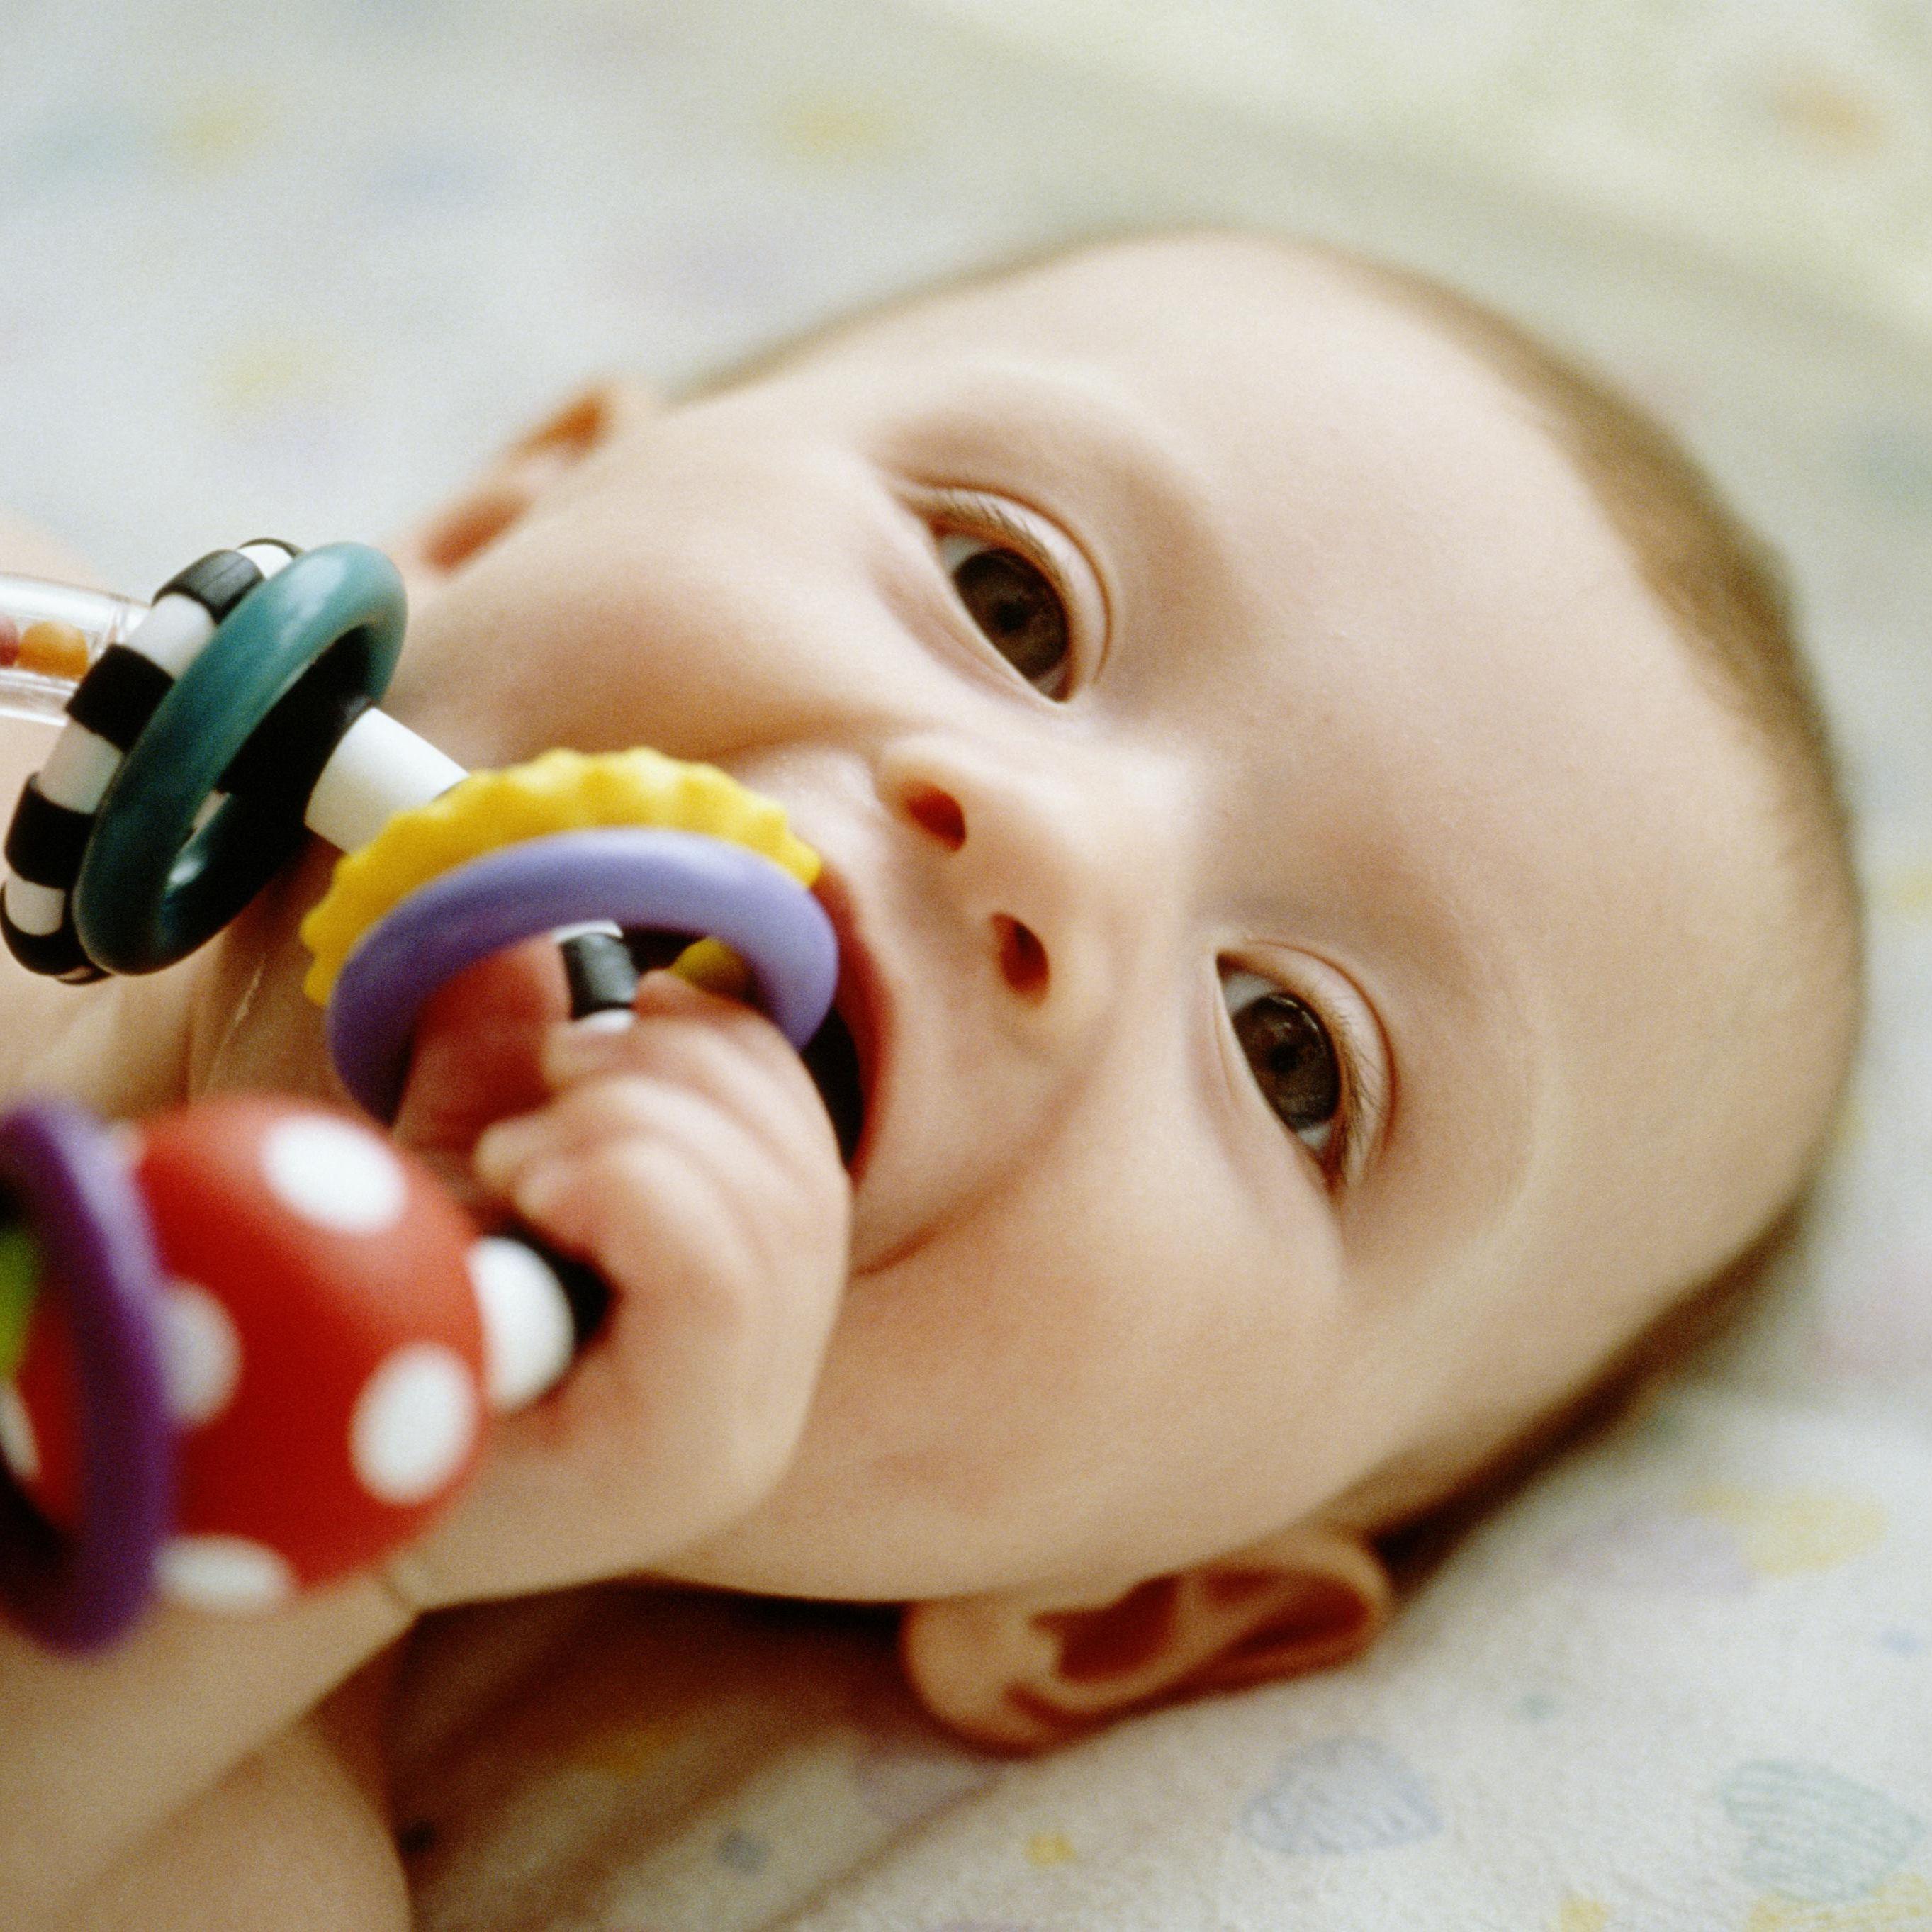 5 x Baby Kid Toddler Infant Newborn Cookie Teether Toy Gum Massager Chew Toy